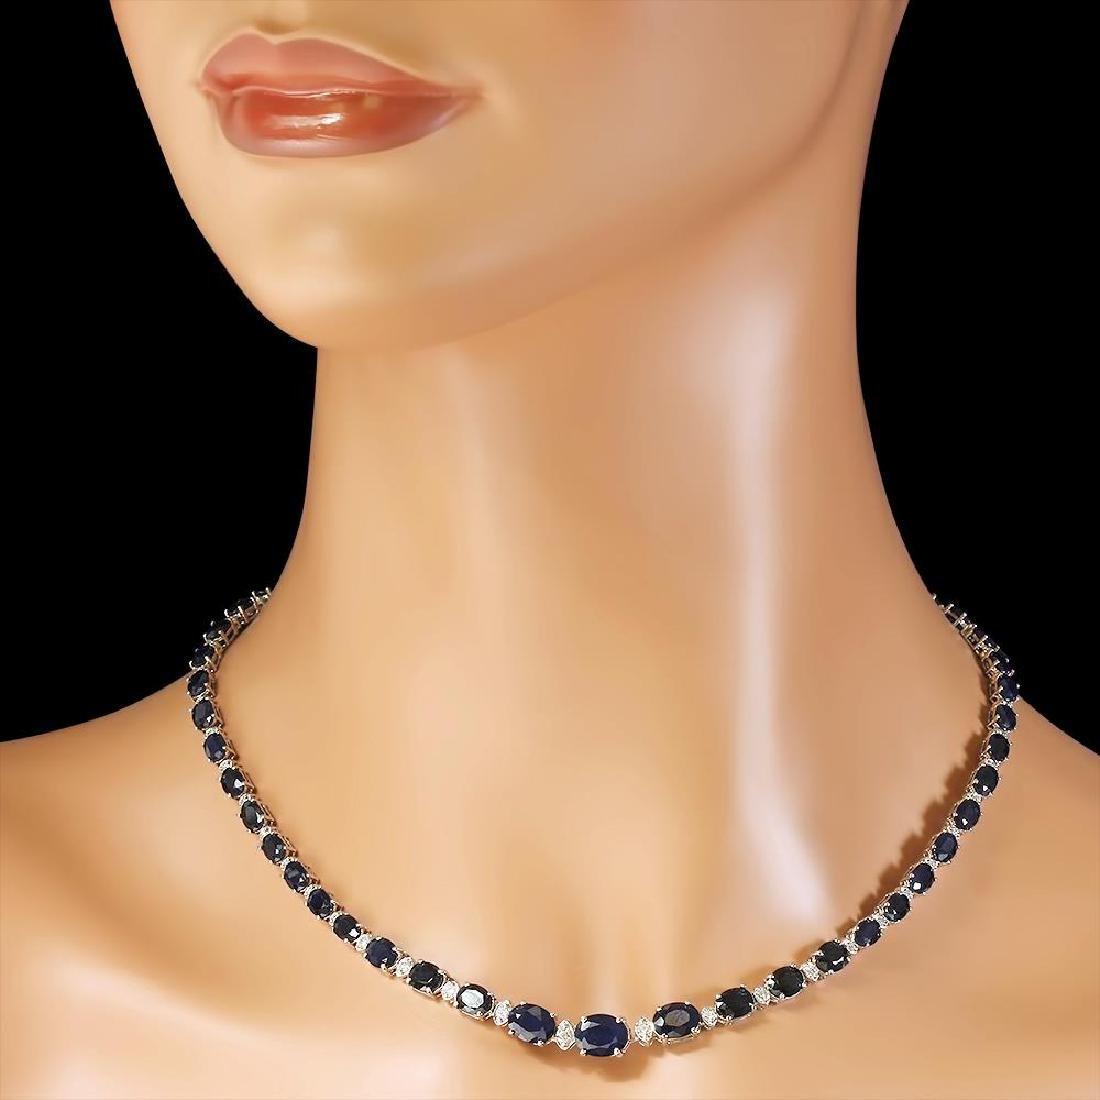 14k Gold 30.19ct Sapphire 1.25ct Diamond Necklace - 2